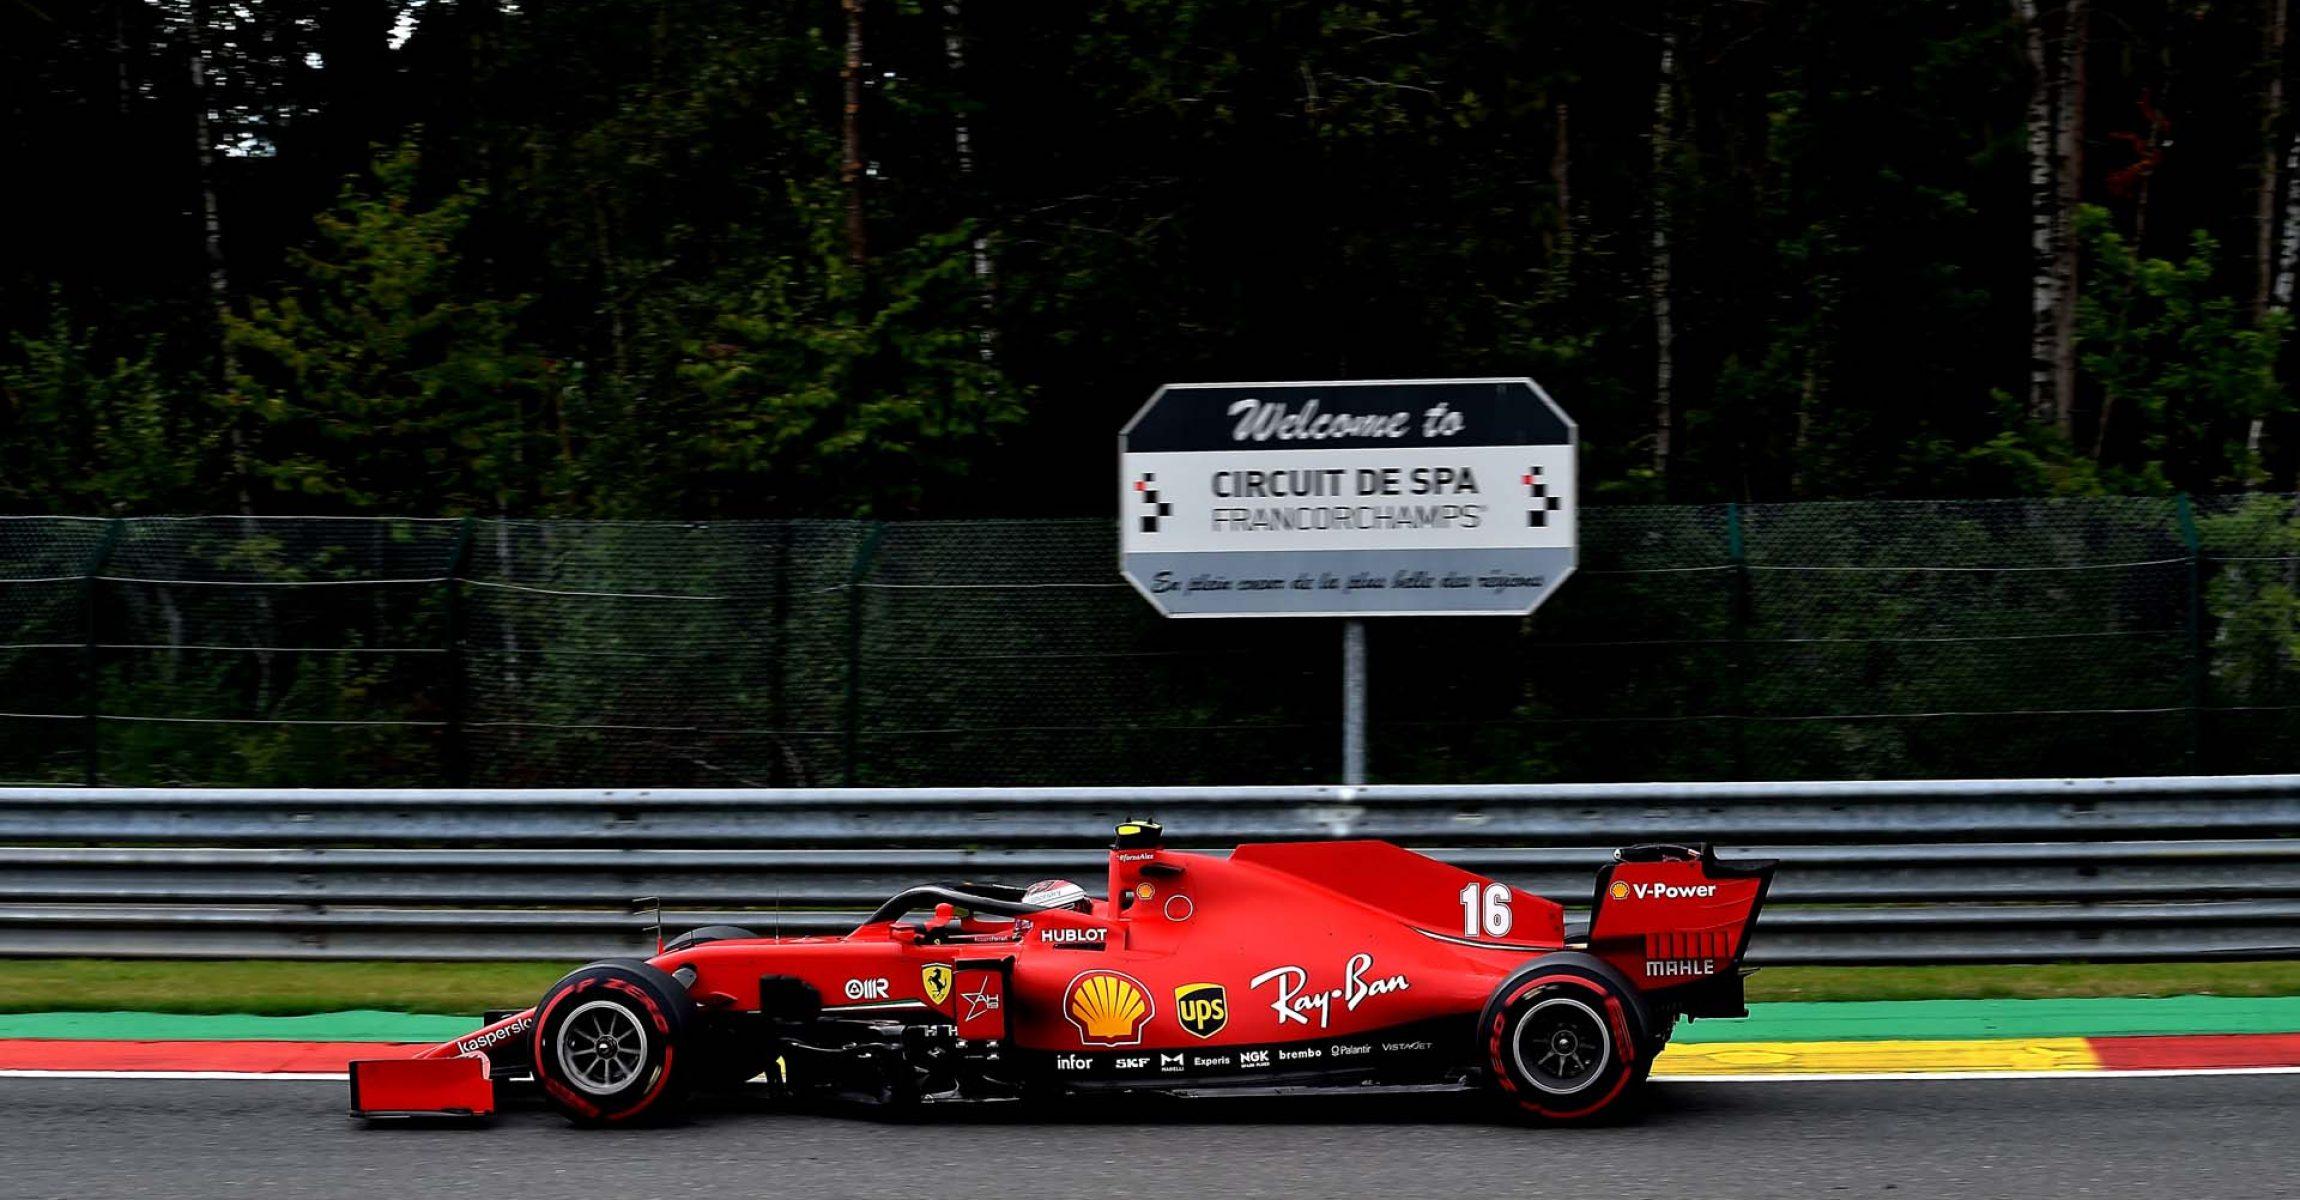 GP BELGIO F1/2020 -  VENERDÌ 28/08/2020   credit: @Scuderia Ferrari Press Office Charles Leclerc